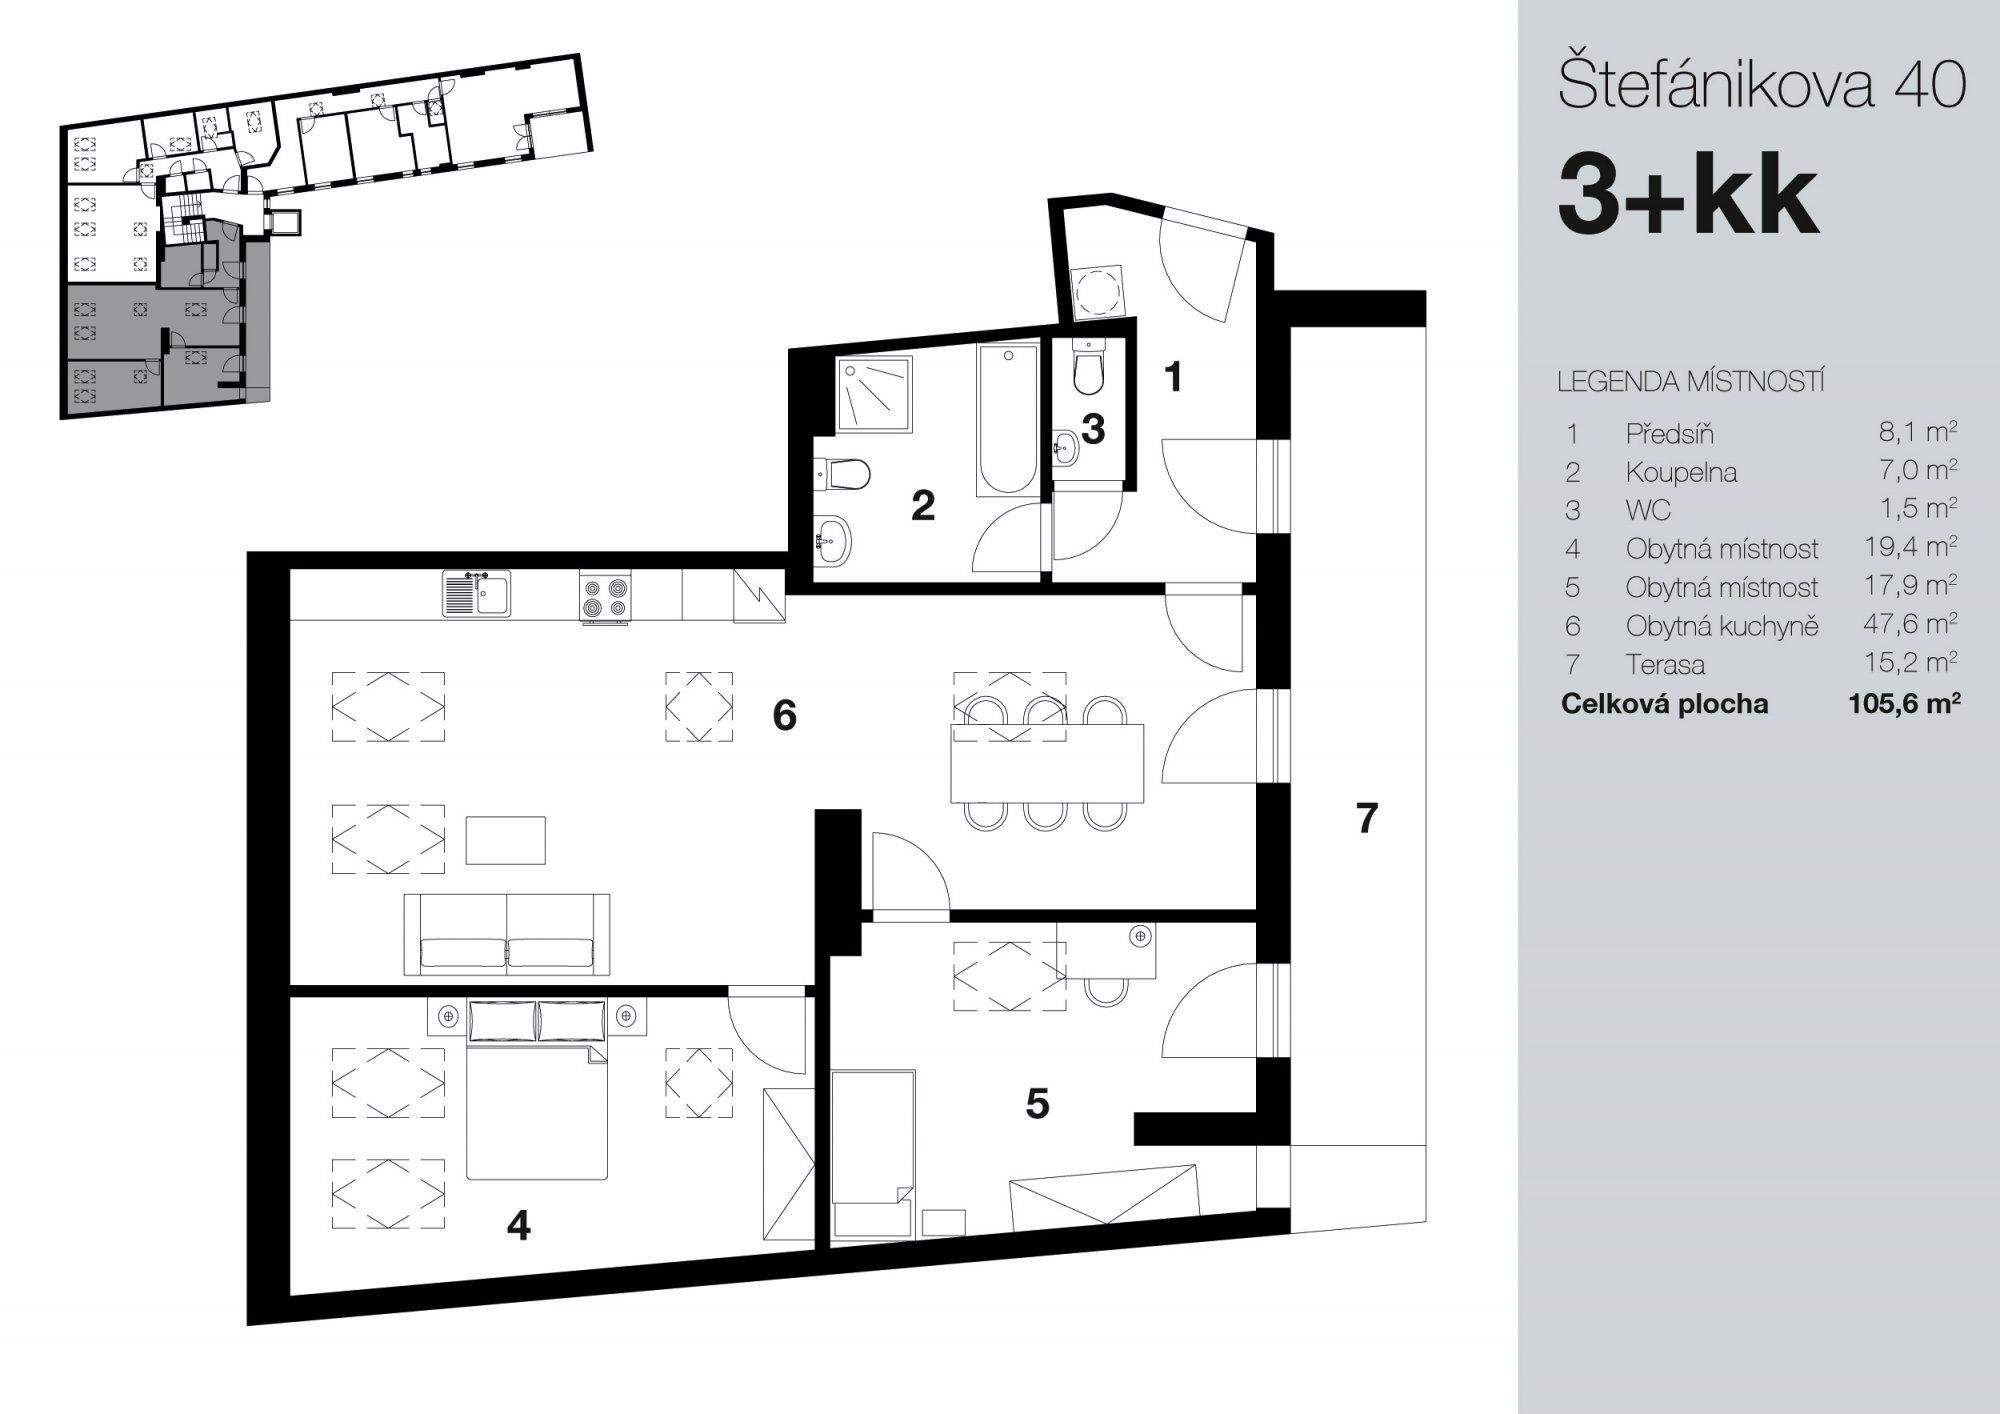 Půdorys - Půdní byt 3+kk, plocha 121 m², ulice Štefánikova, Praha 5 - Smíchov